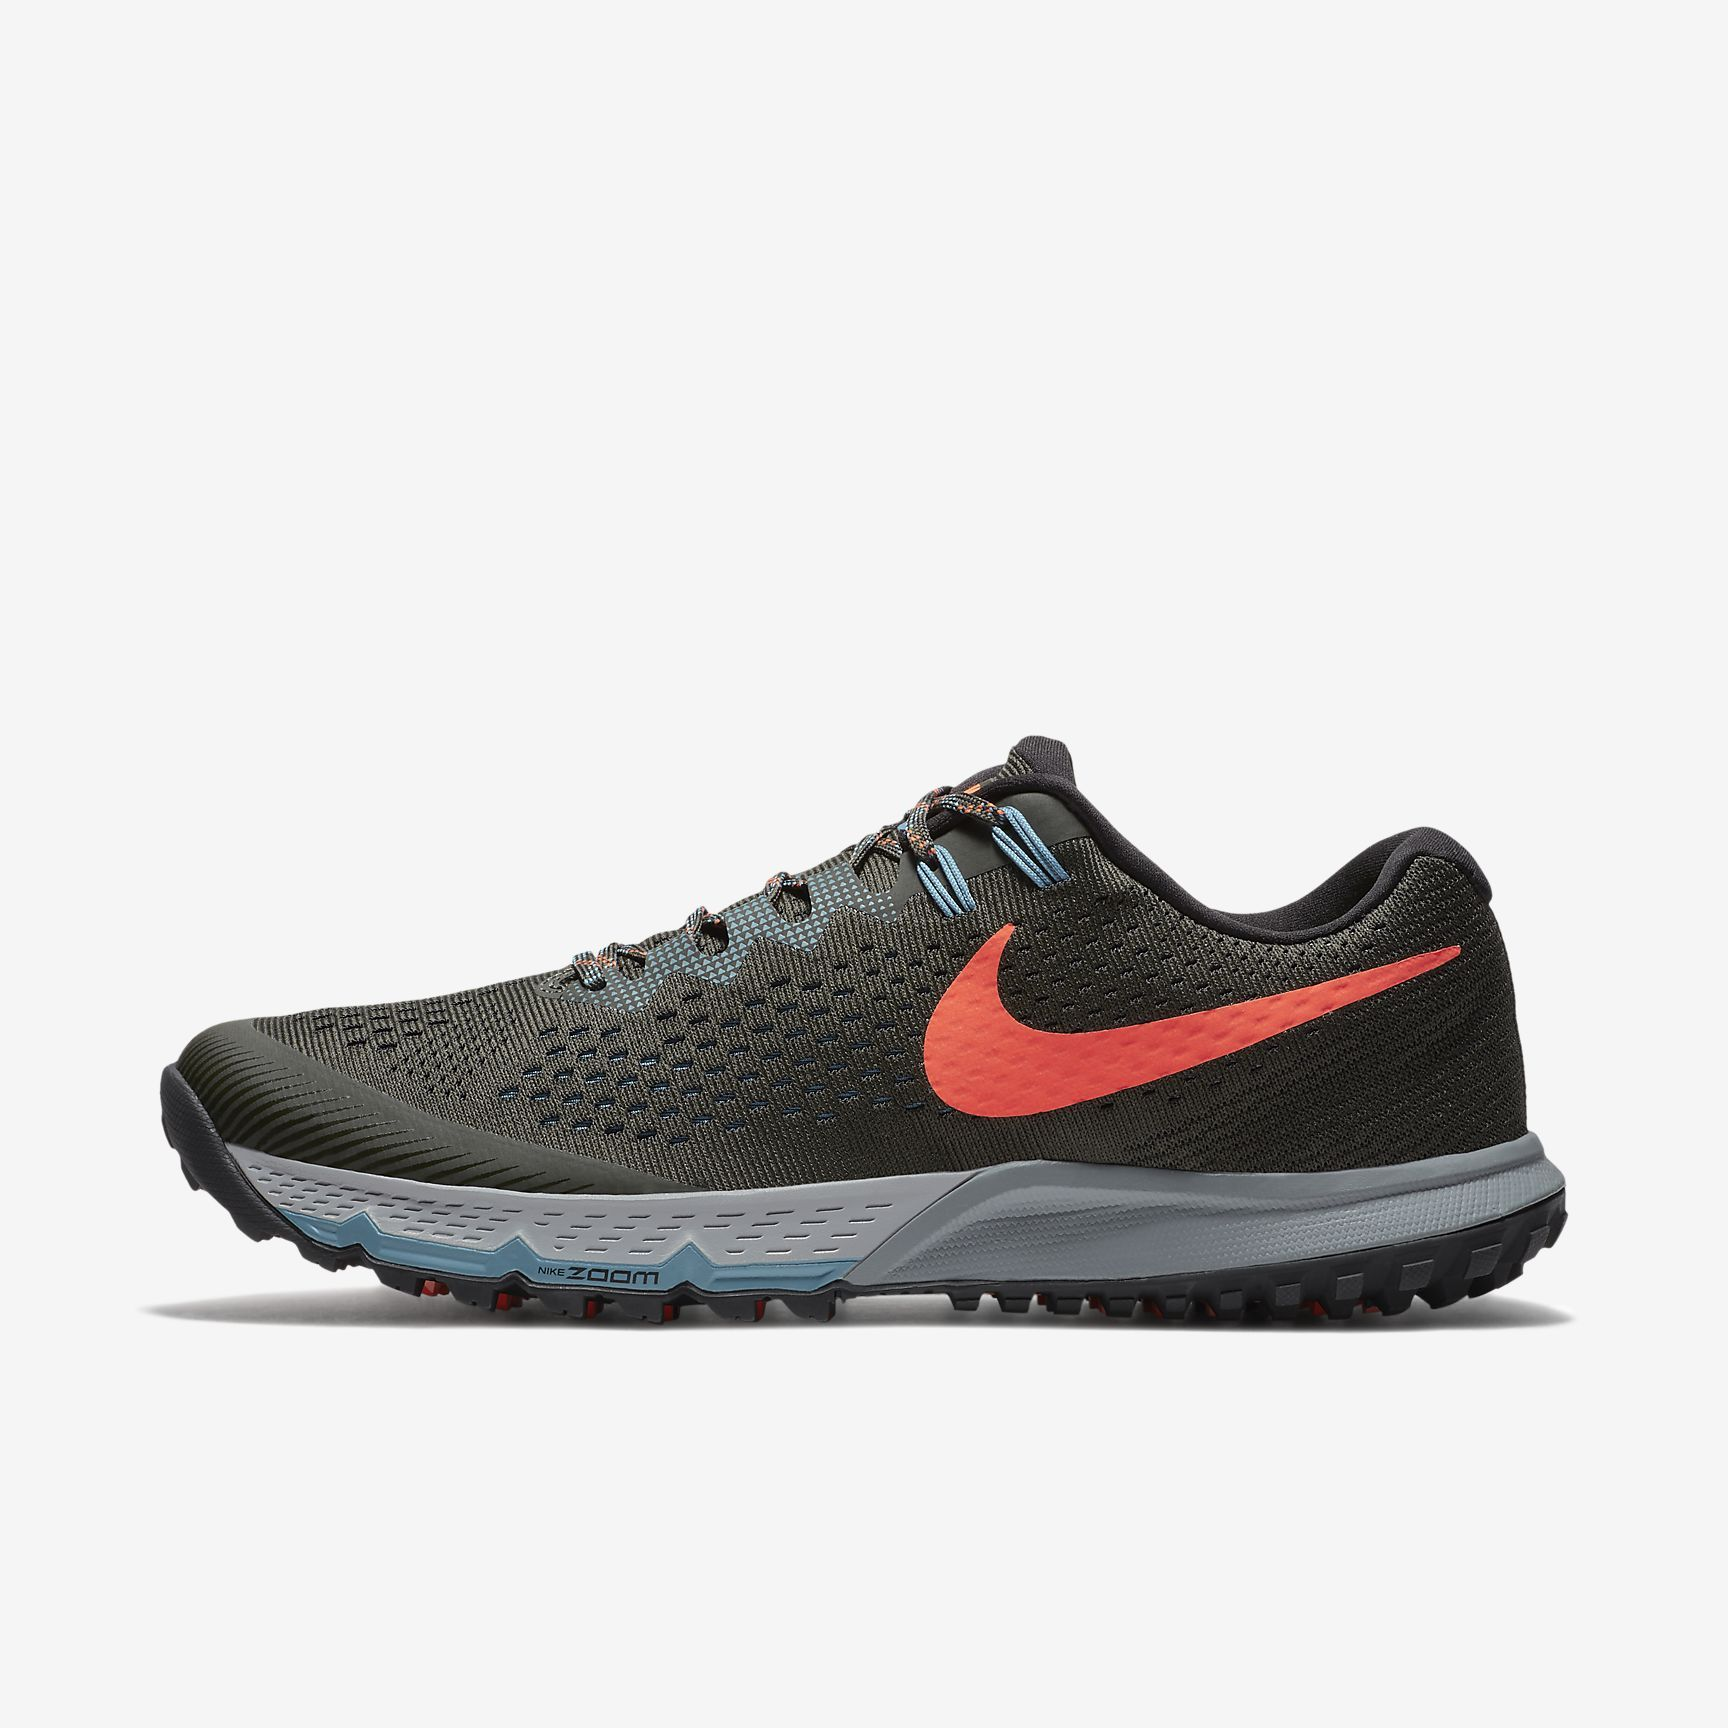 Download Nike Air Zoom Terra Kiger 4 Men S Running Shoe Running Shoes For Men Nike Air Zoom Running Shoes